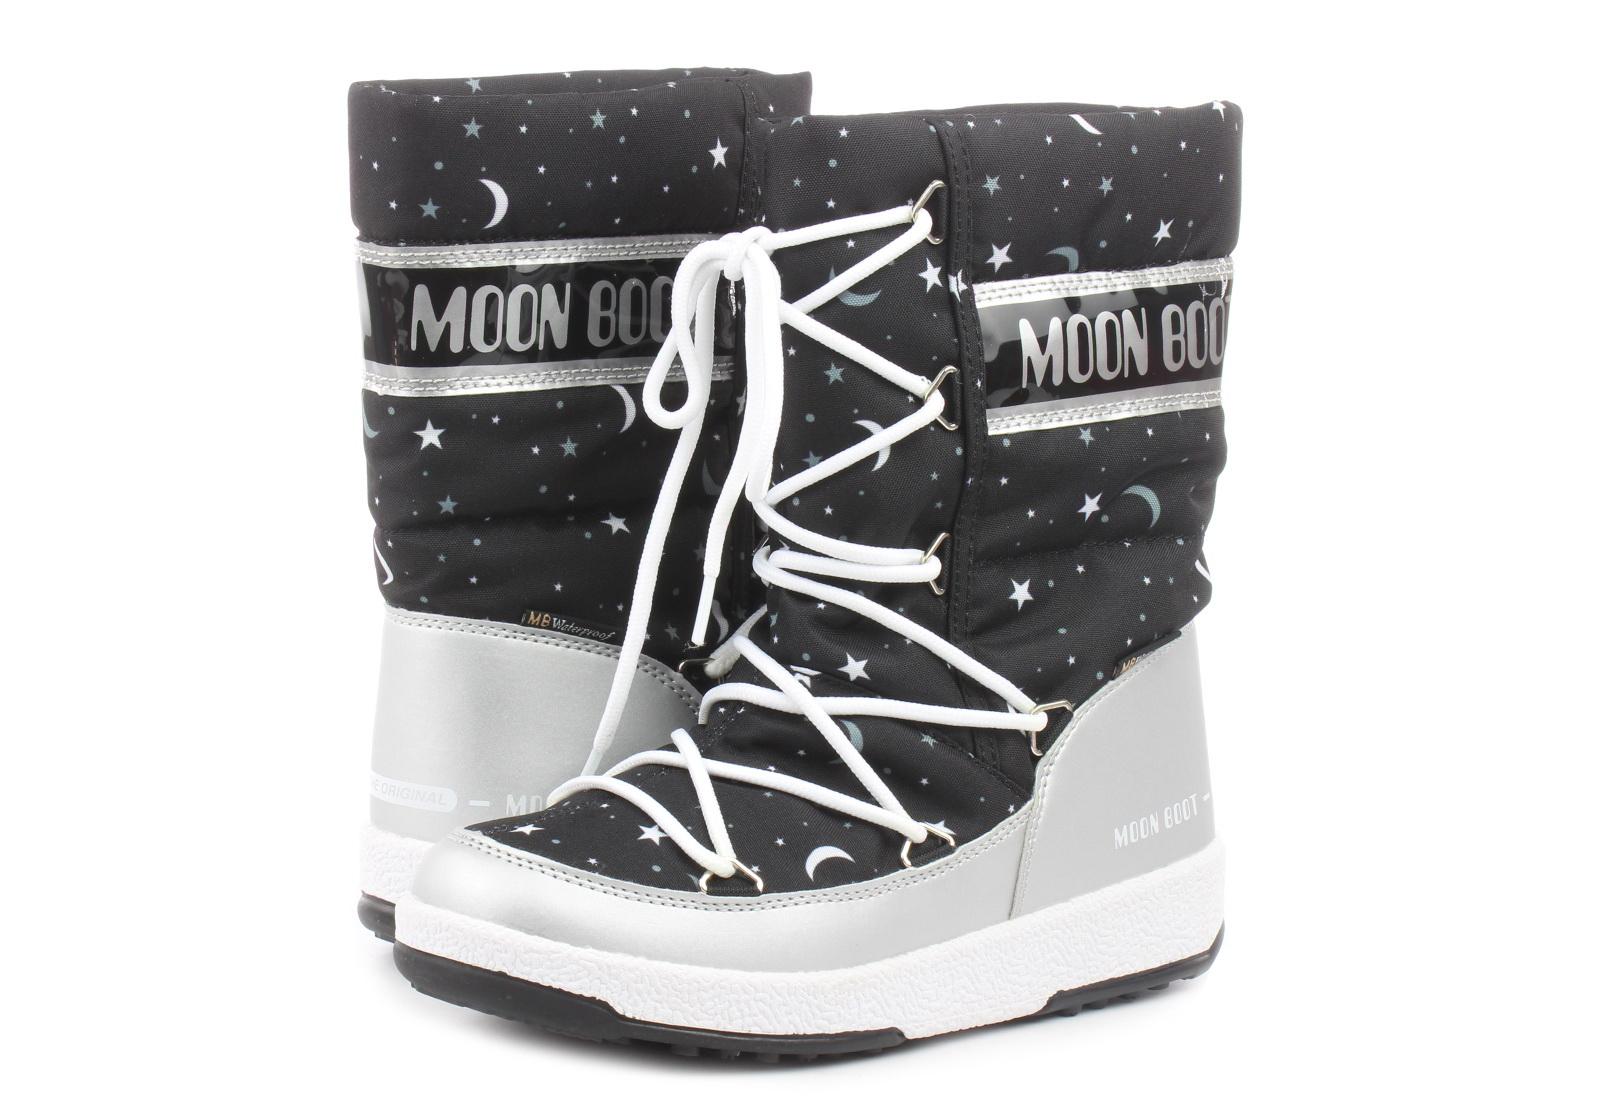 Moon Boot Boots Moon Boot Jr Girlq.universe Wp